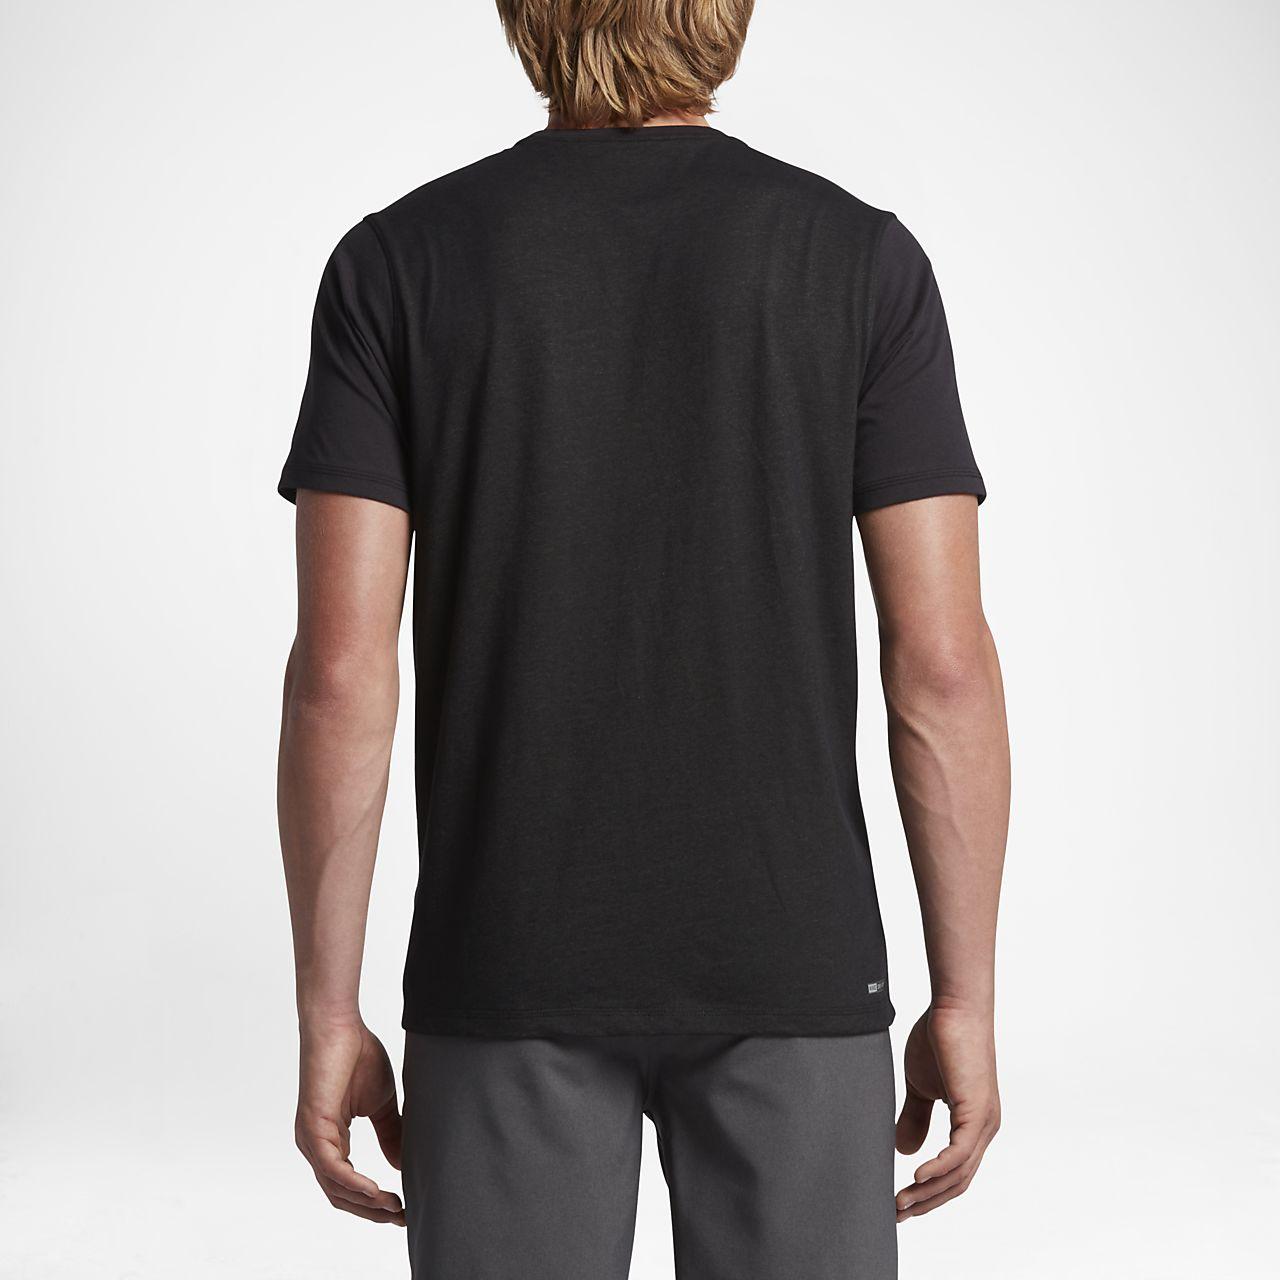 ... Hurley Dri-FIT Lagos Pocket Crew Men's T-Shirt